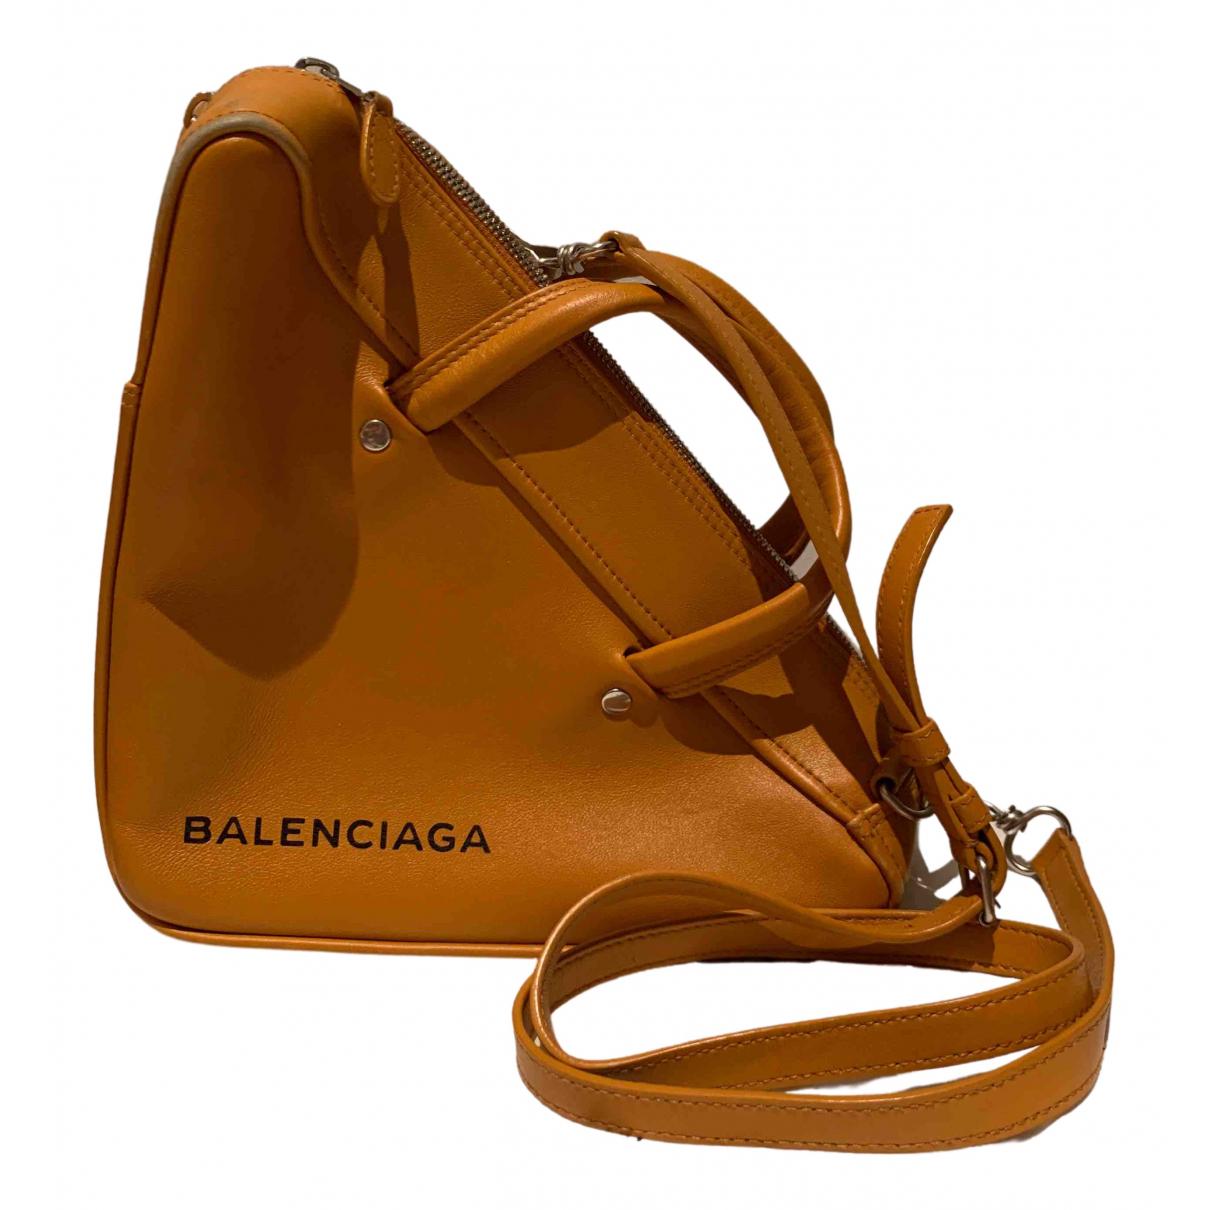 Balenciaga - Sac a main Triangle pour femme en cuir - marron